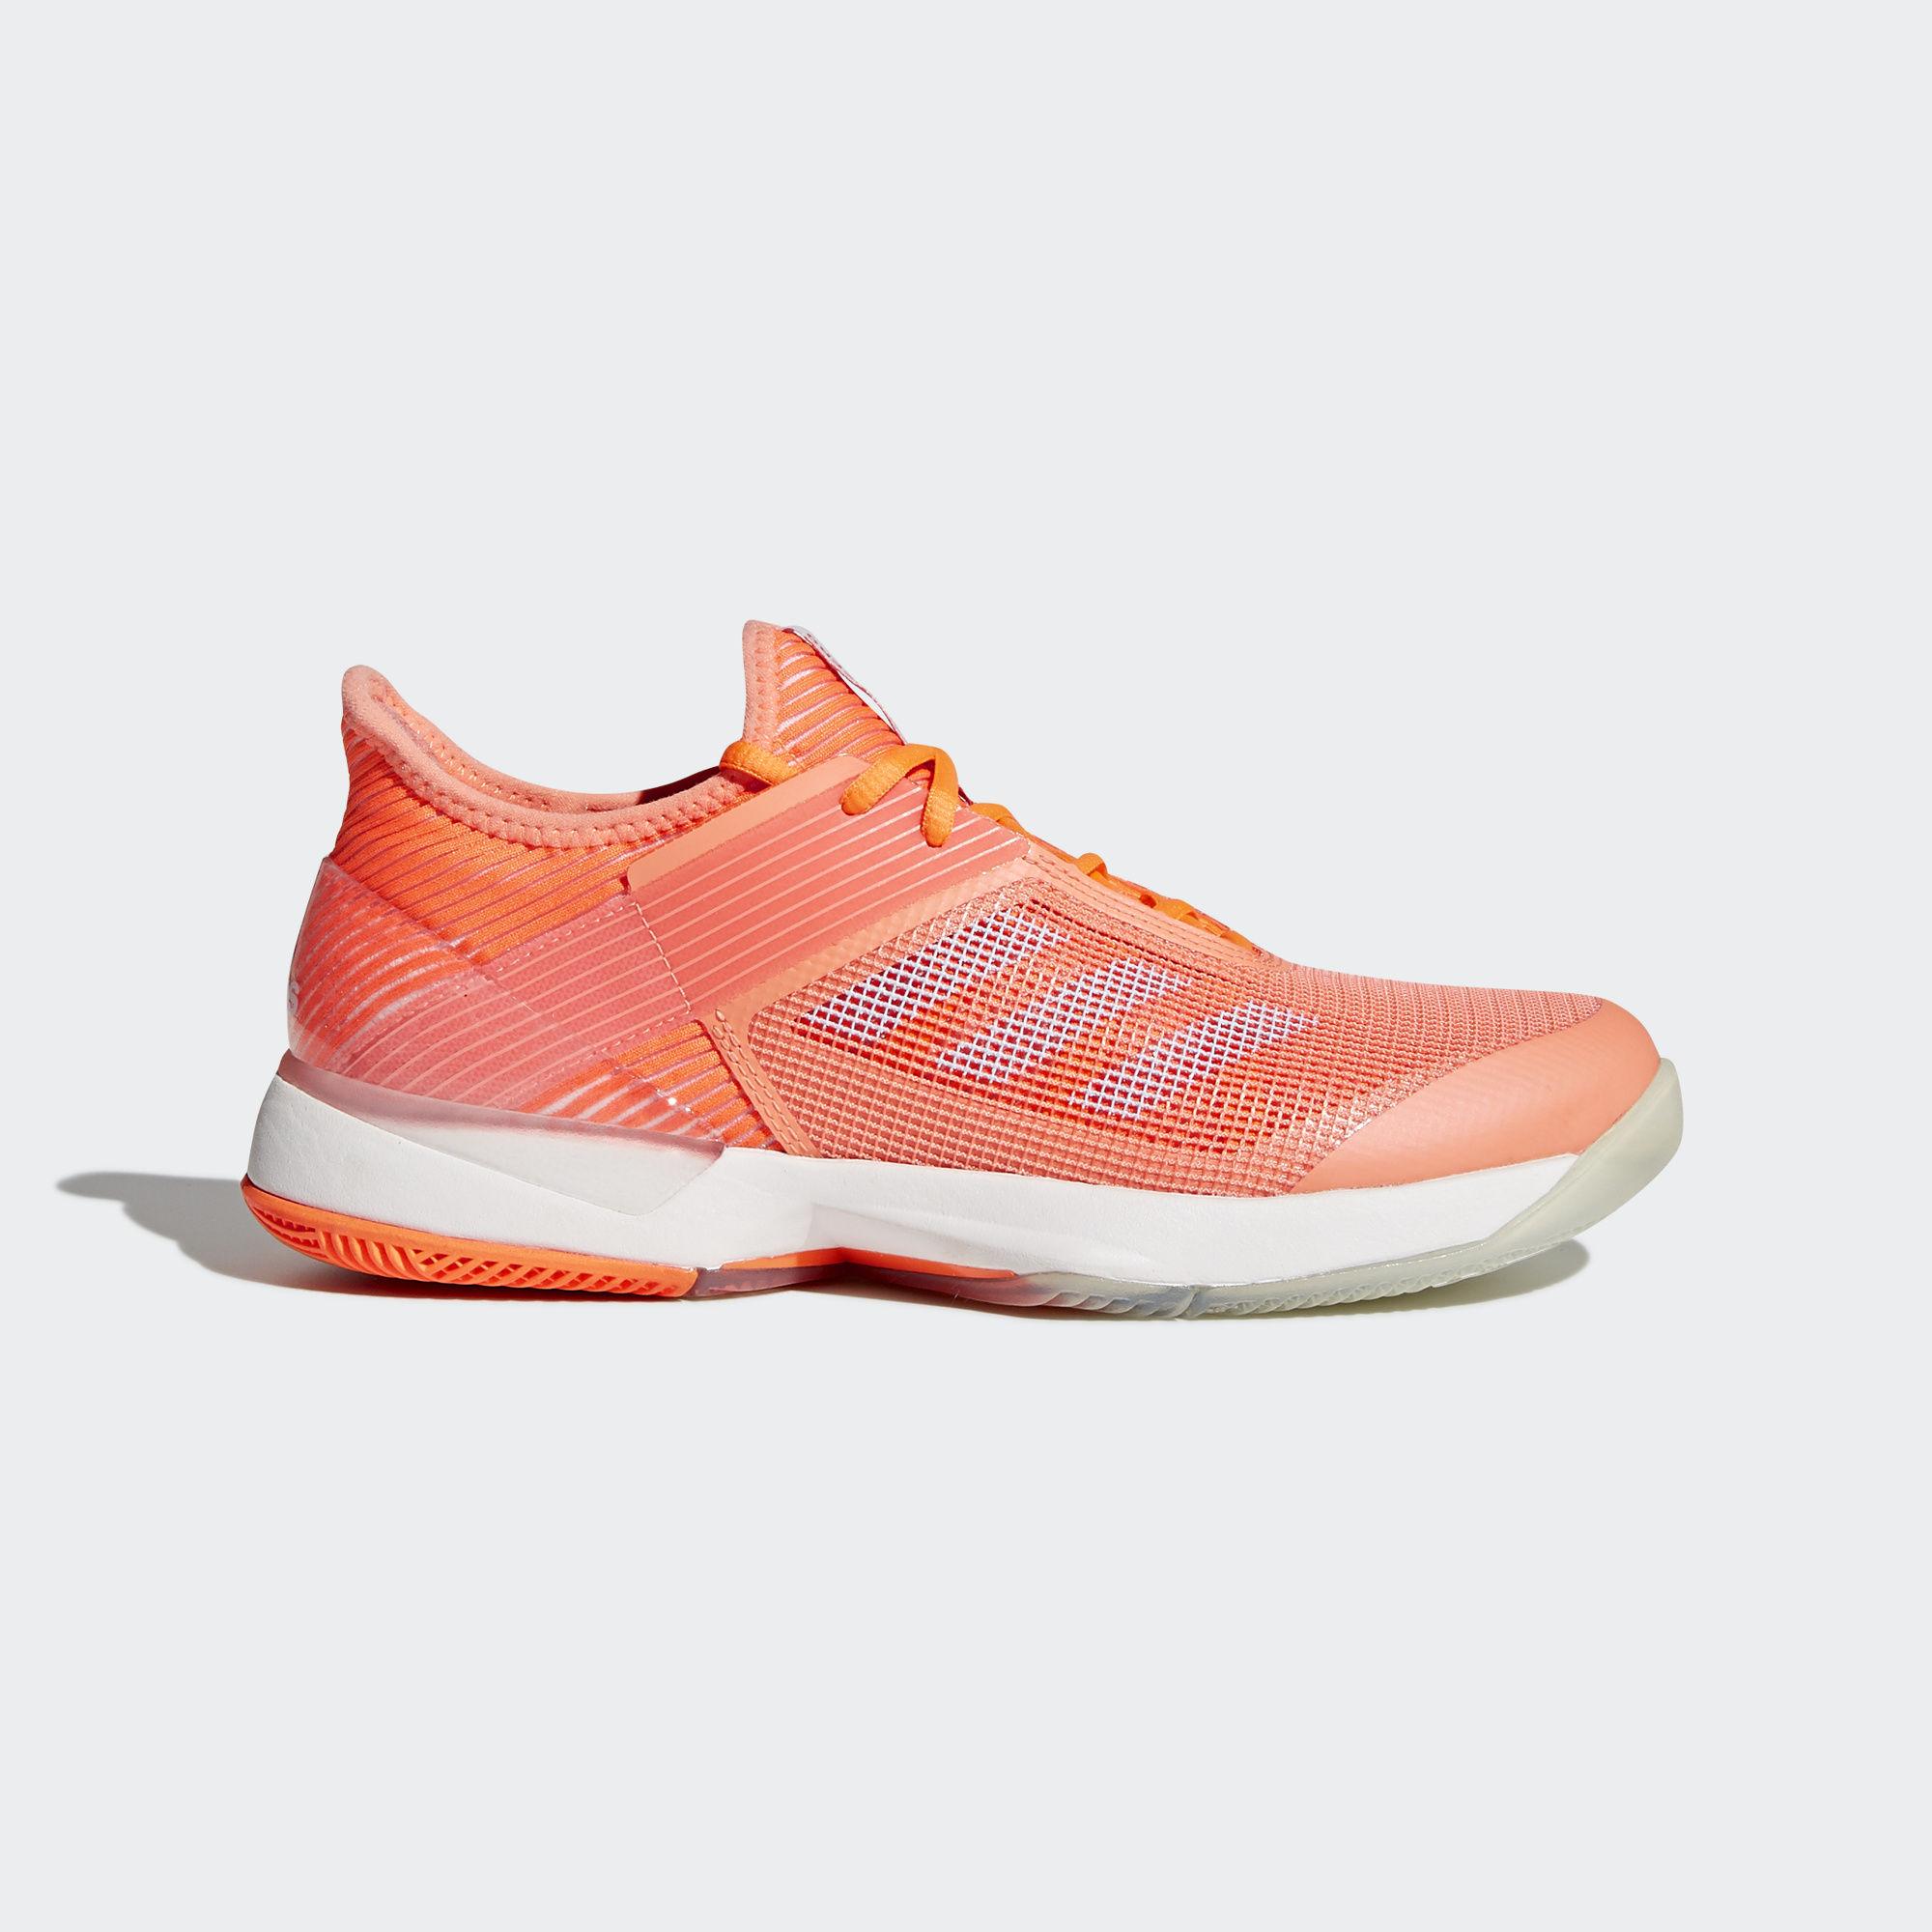 adidas chaussure tennis